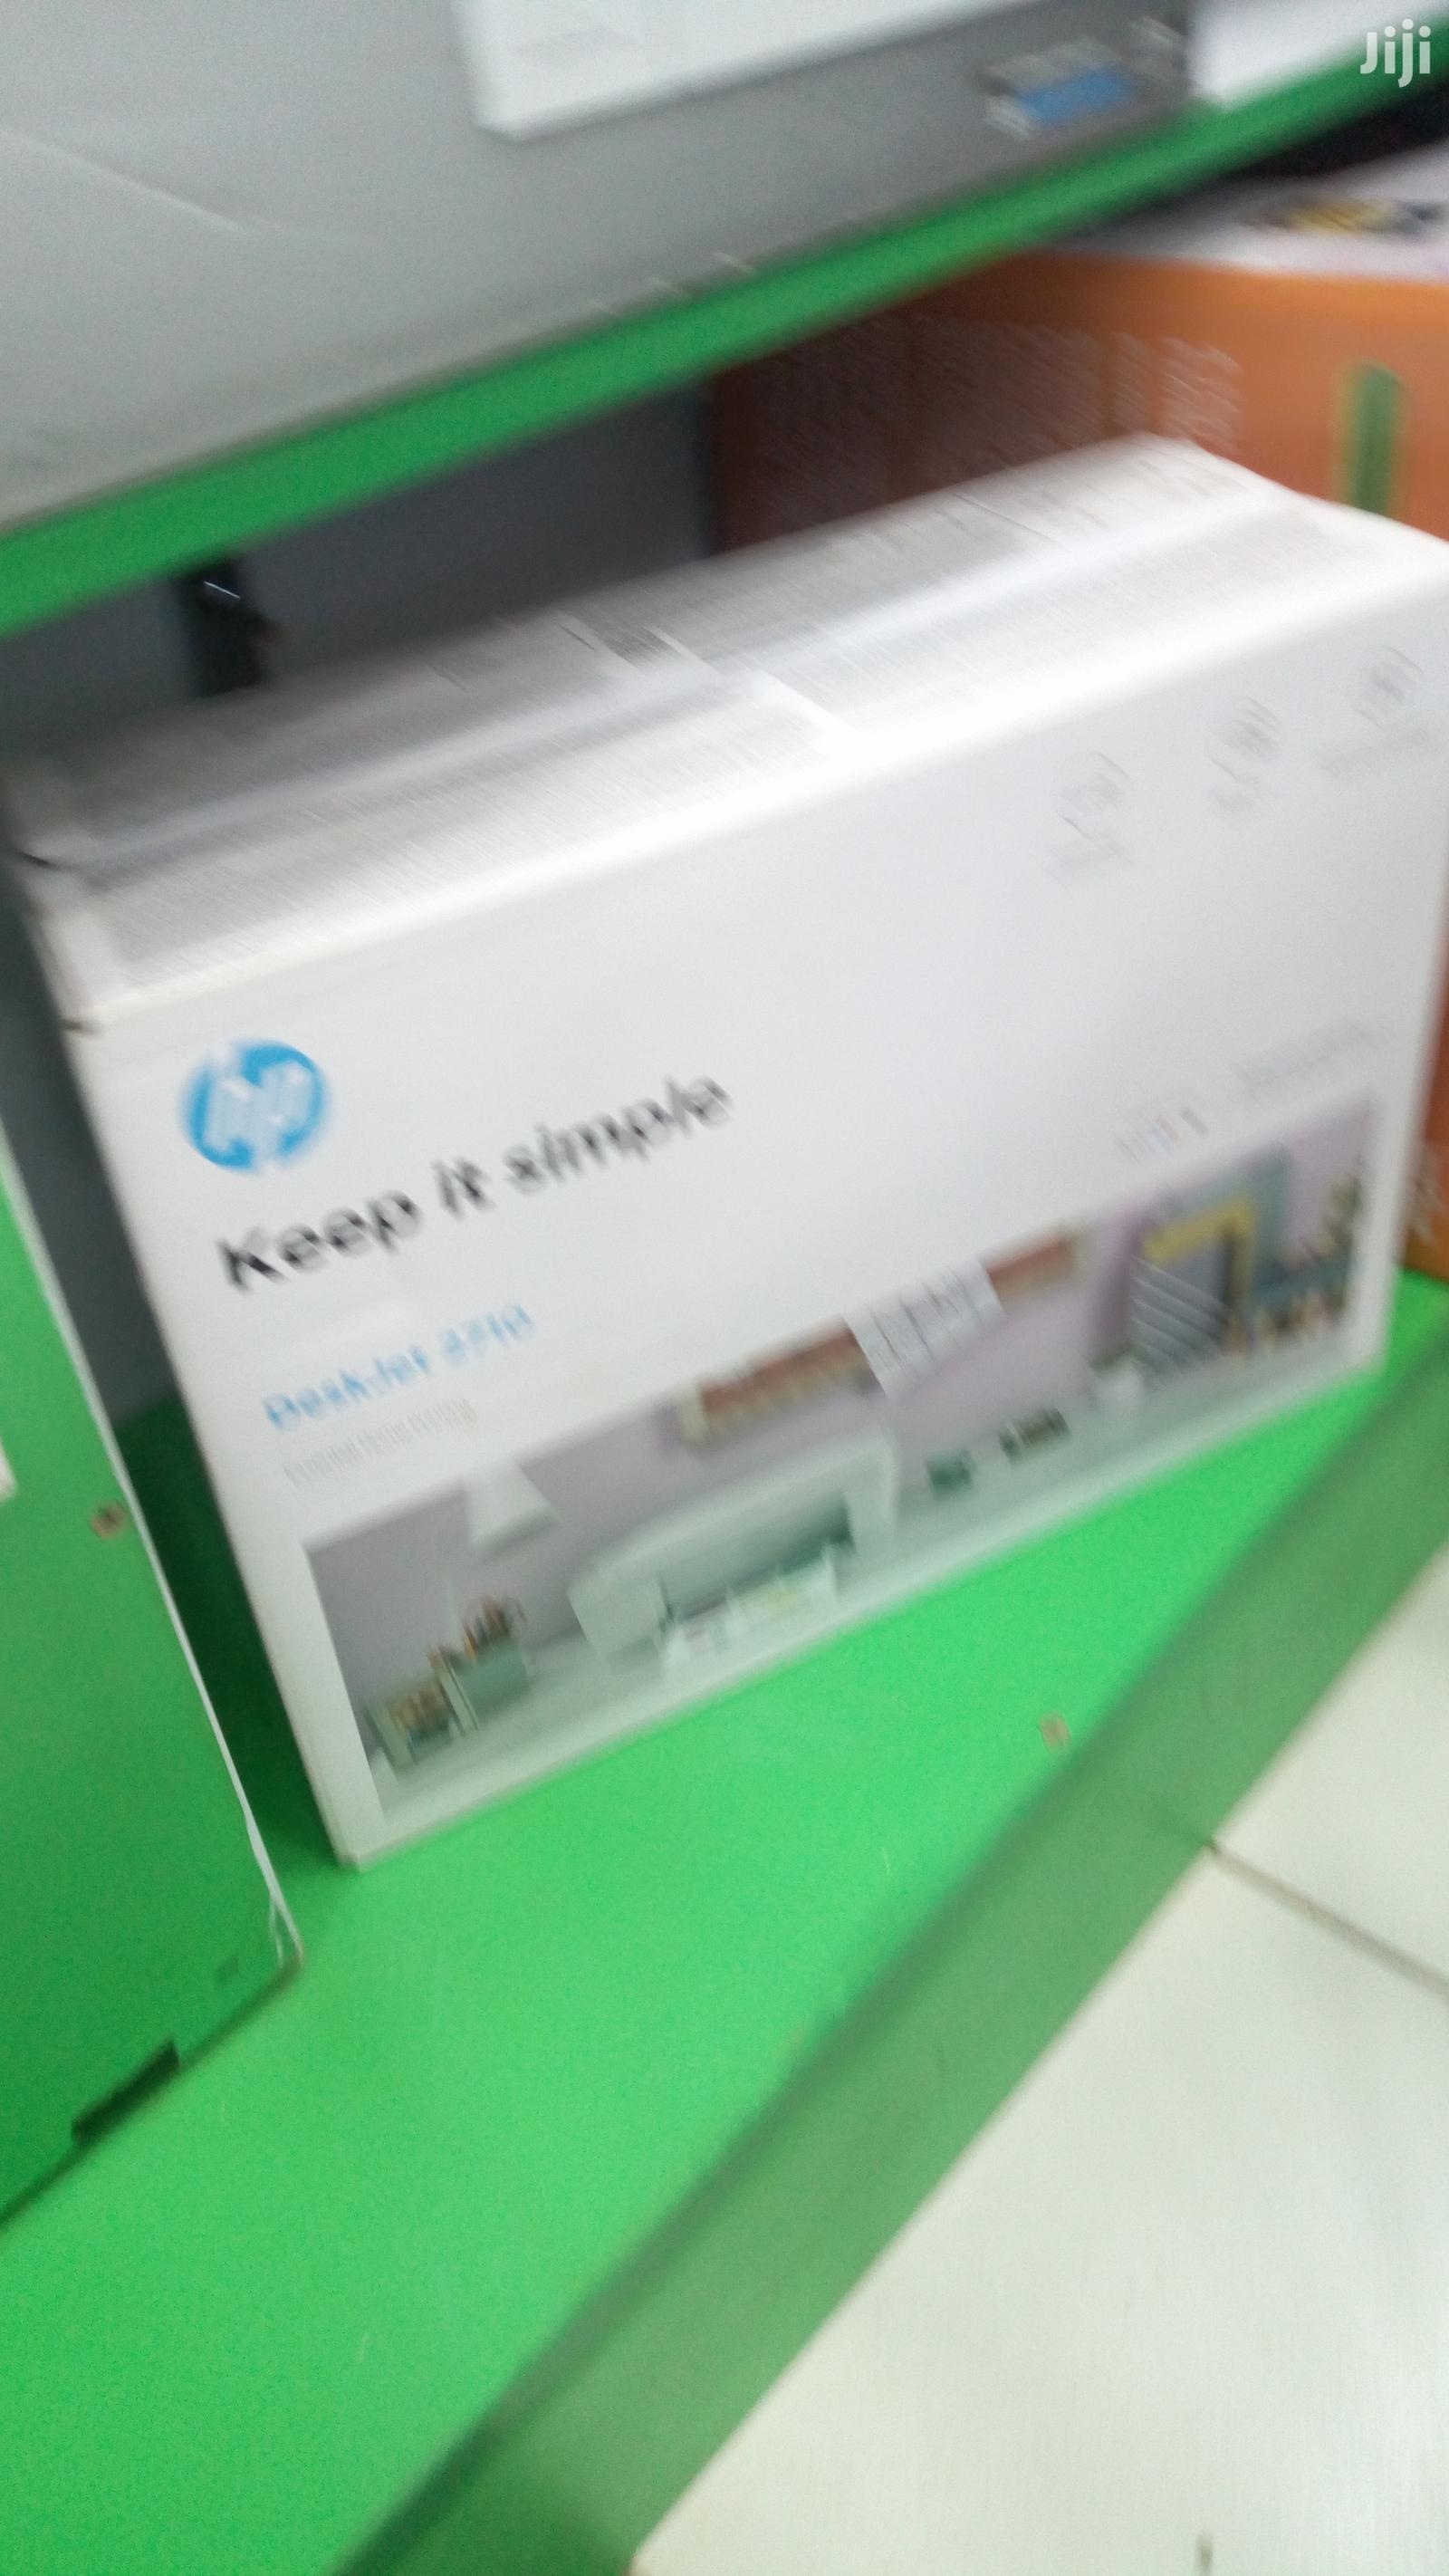 All in One HP Deskjet 2710 Wireless Printer   Printers & Scanners for sale in Kampala, Central Region, Uganda